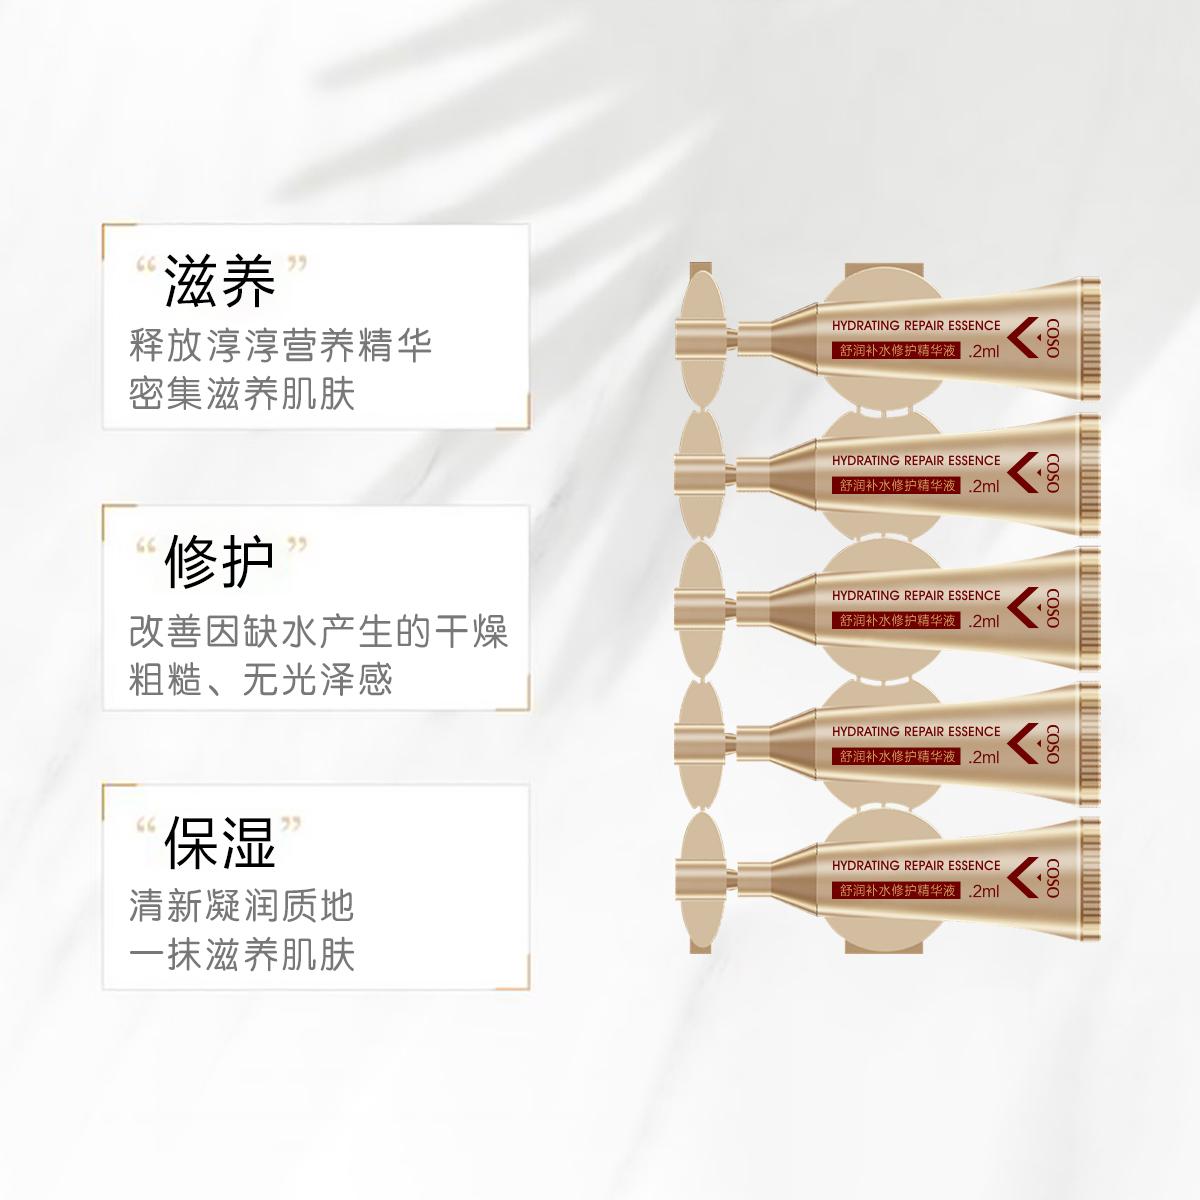 40g-2ml×5支卡秀沙滩小金瓶·舒润补水防晒套装-详情页-主图_04_wps图片